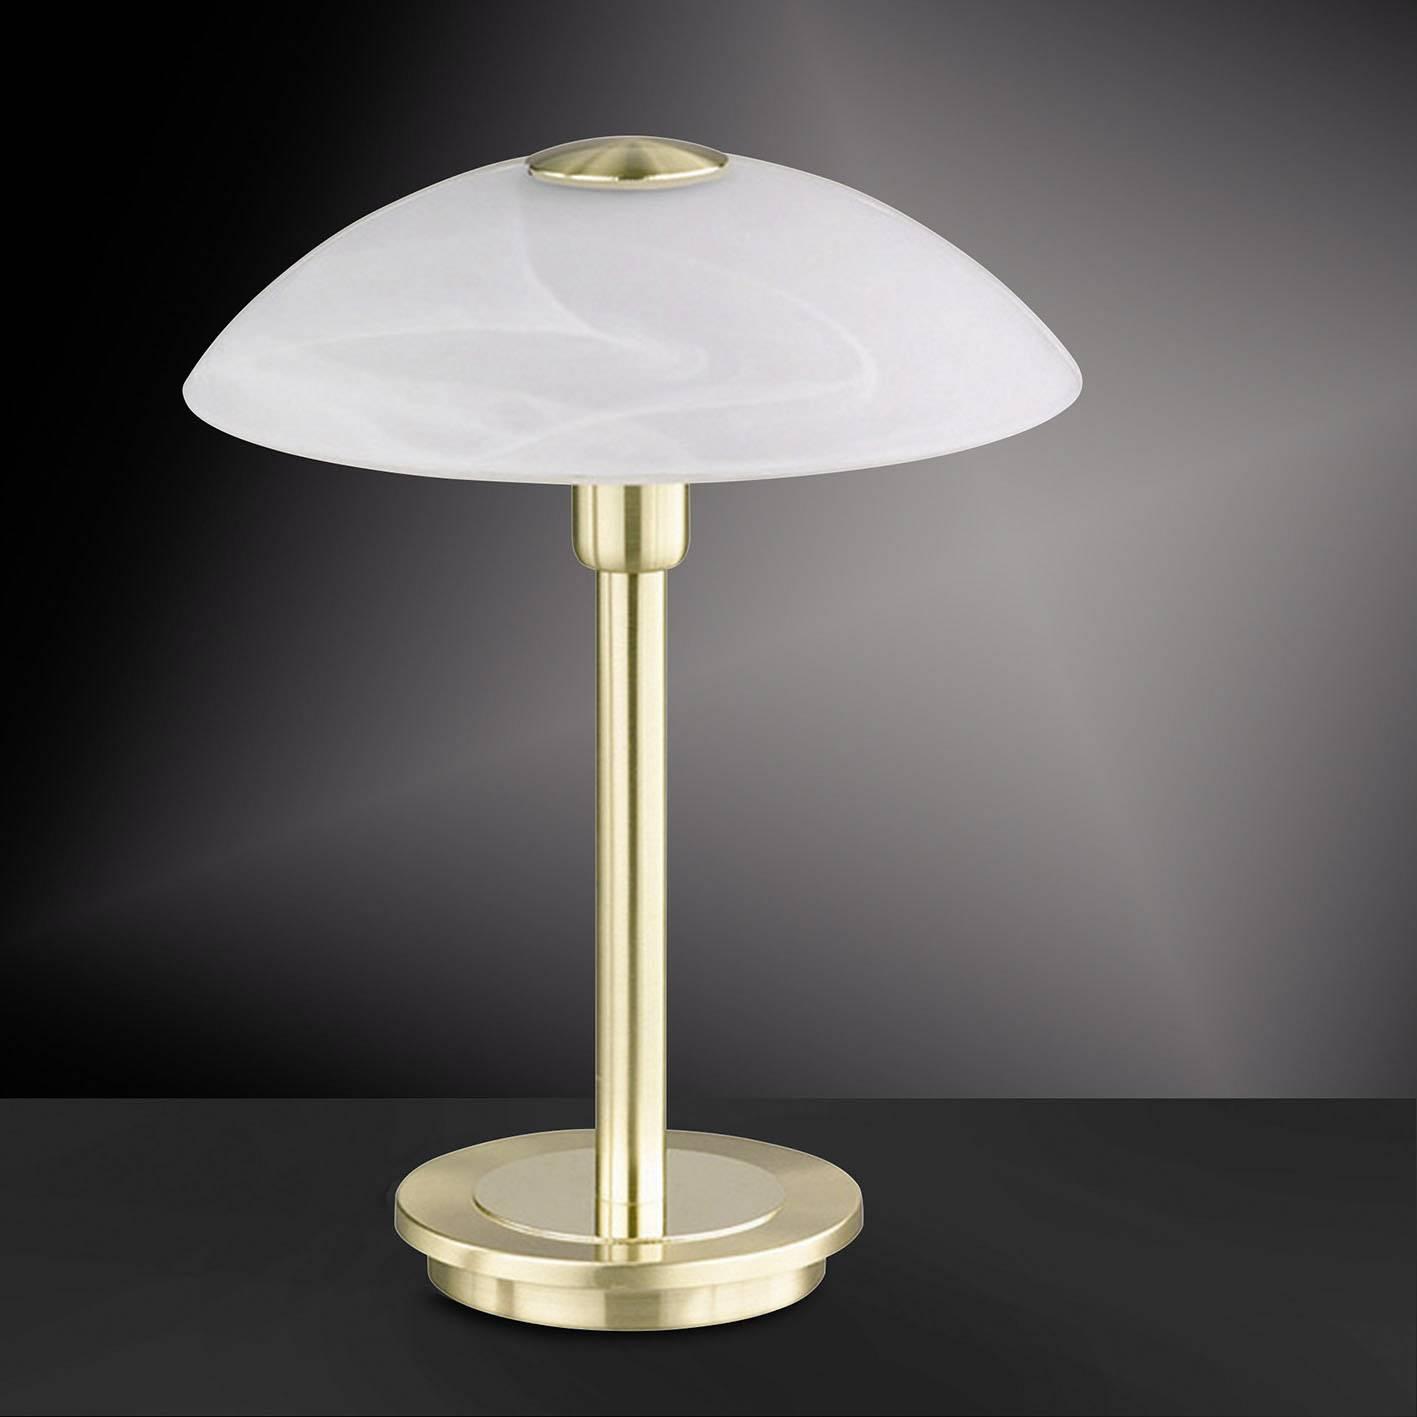 Lampe de table 1x G9 Paul Neuhaus ENOVA 4235 60 laiton mat, opale 1 pcs   Conrad.fr